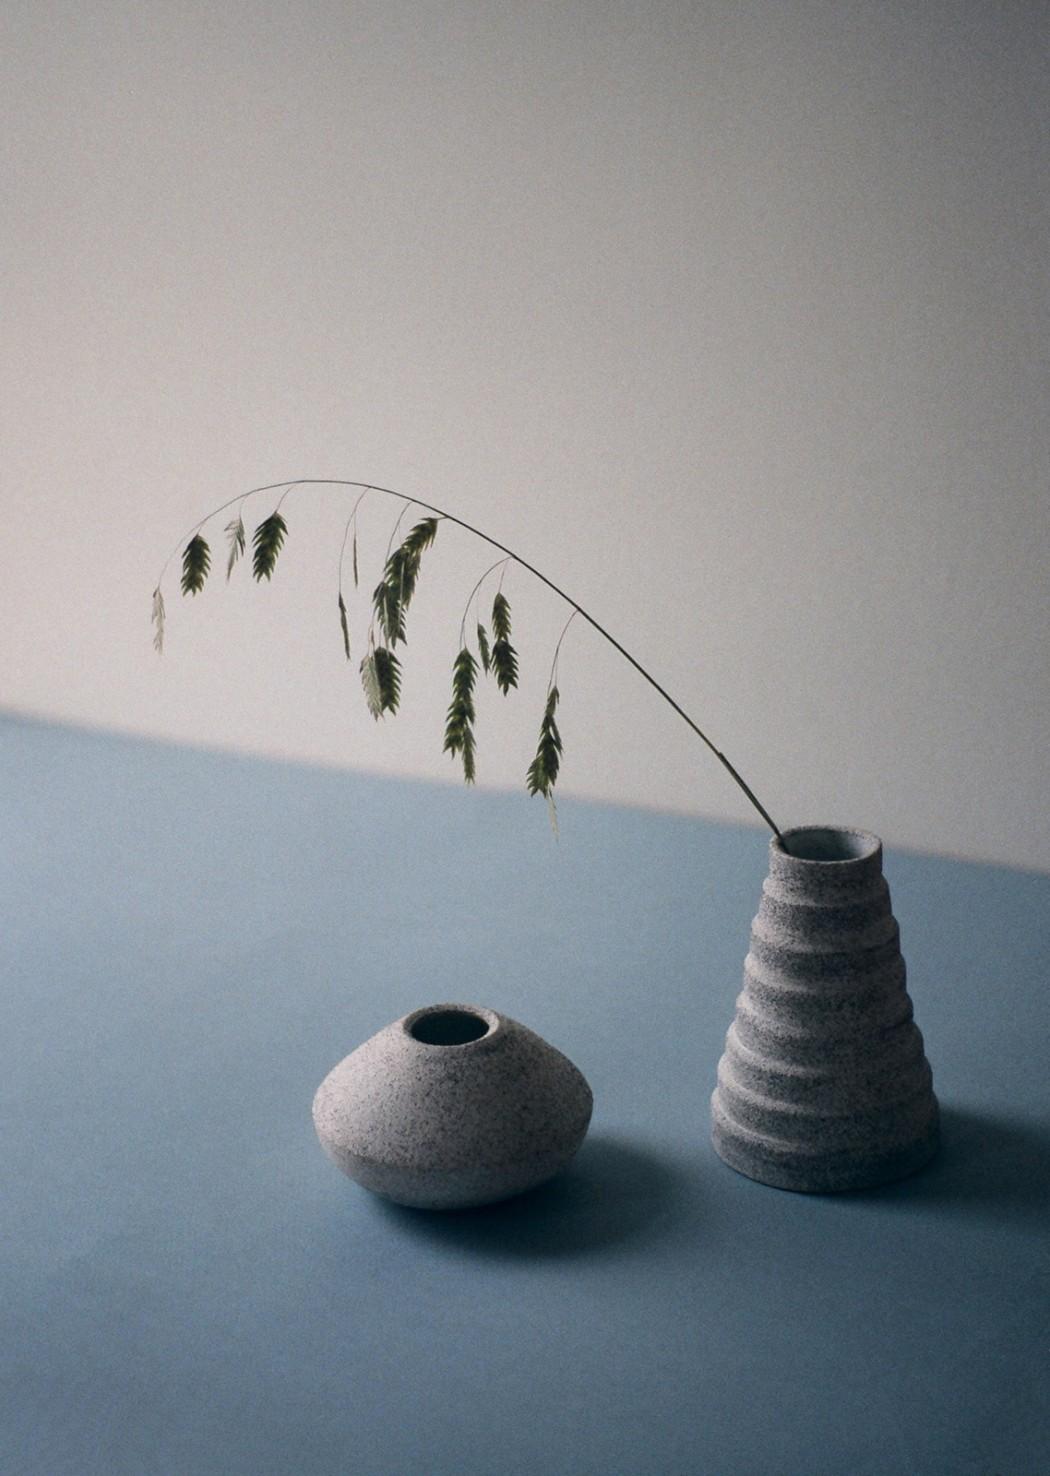 Design-Natalie-Weinberger-Ceramics-3-1-1050x1476